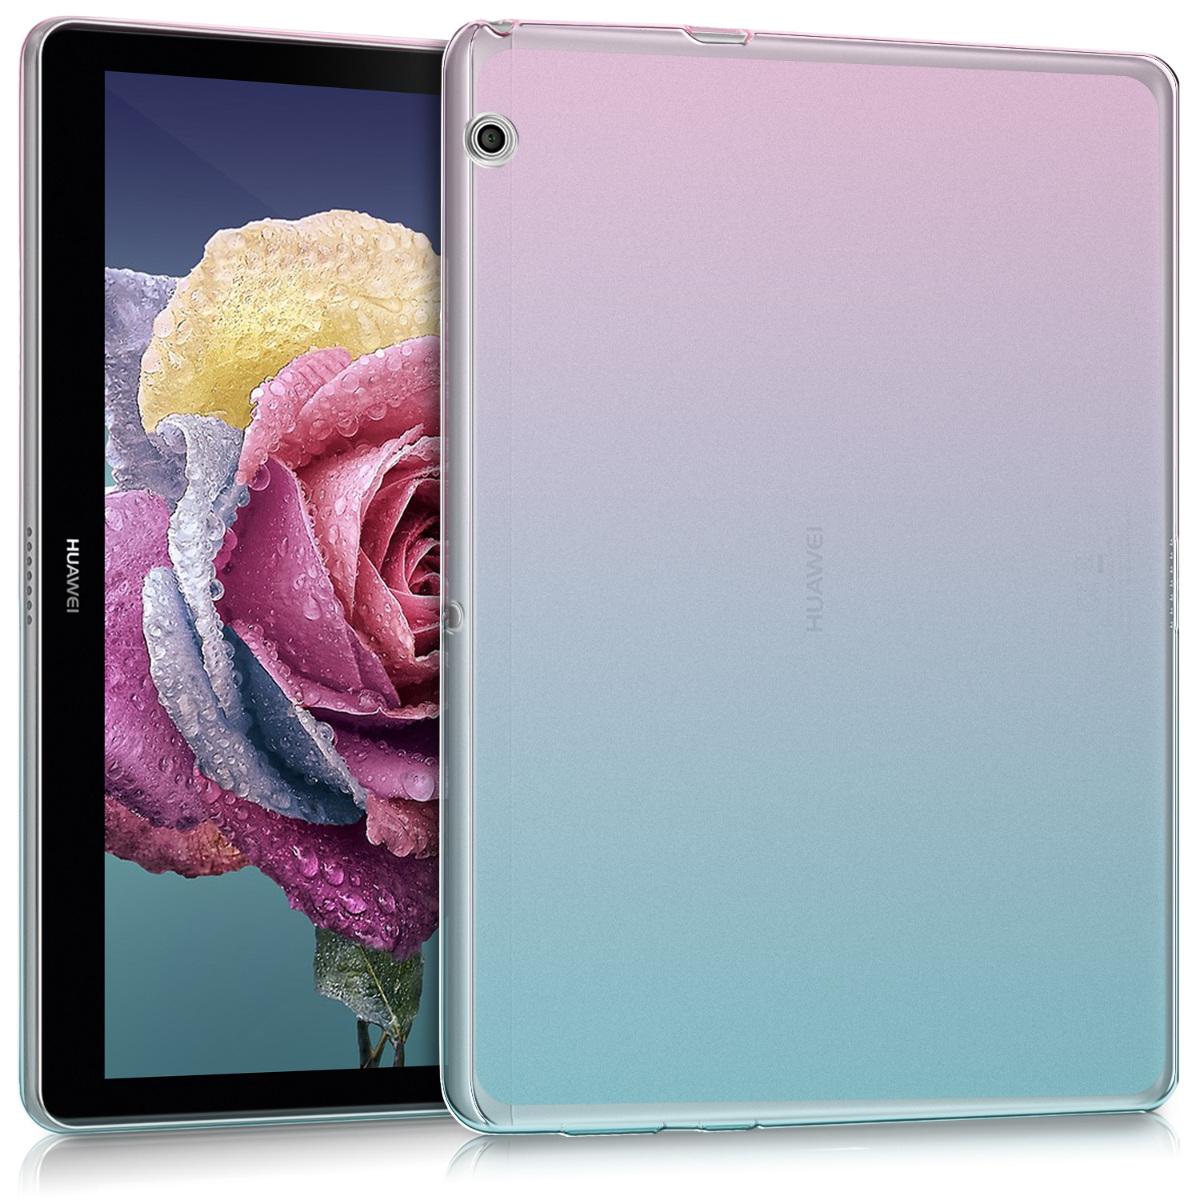 KW Ημιδιάφανη Θήκη Σιλικόνης Huawei MediaPad T3 10 - Soft Flexible Shock Absorbent - Dark Pink / Blue / Transparent (42649.01)